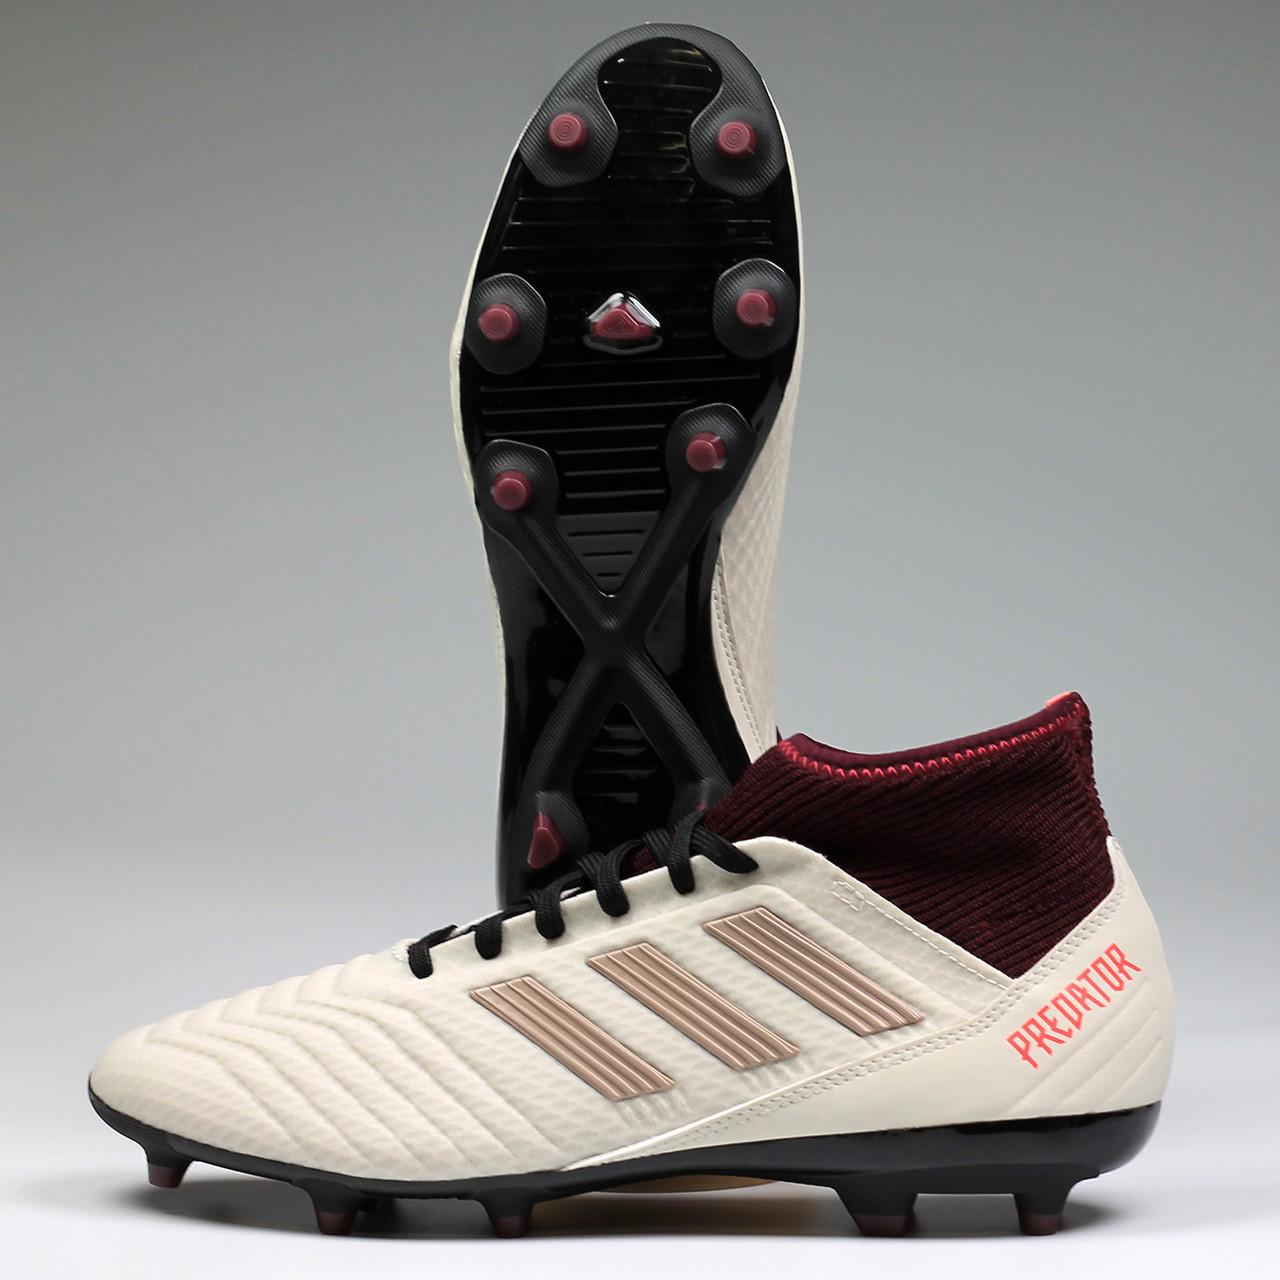 a79e54343 ... Adidas Predator 18.3 FG Women s Soccer Cleats DB2511 ...